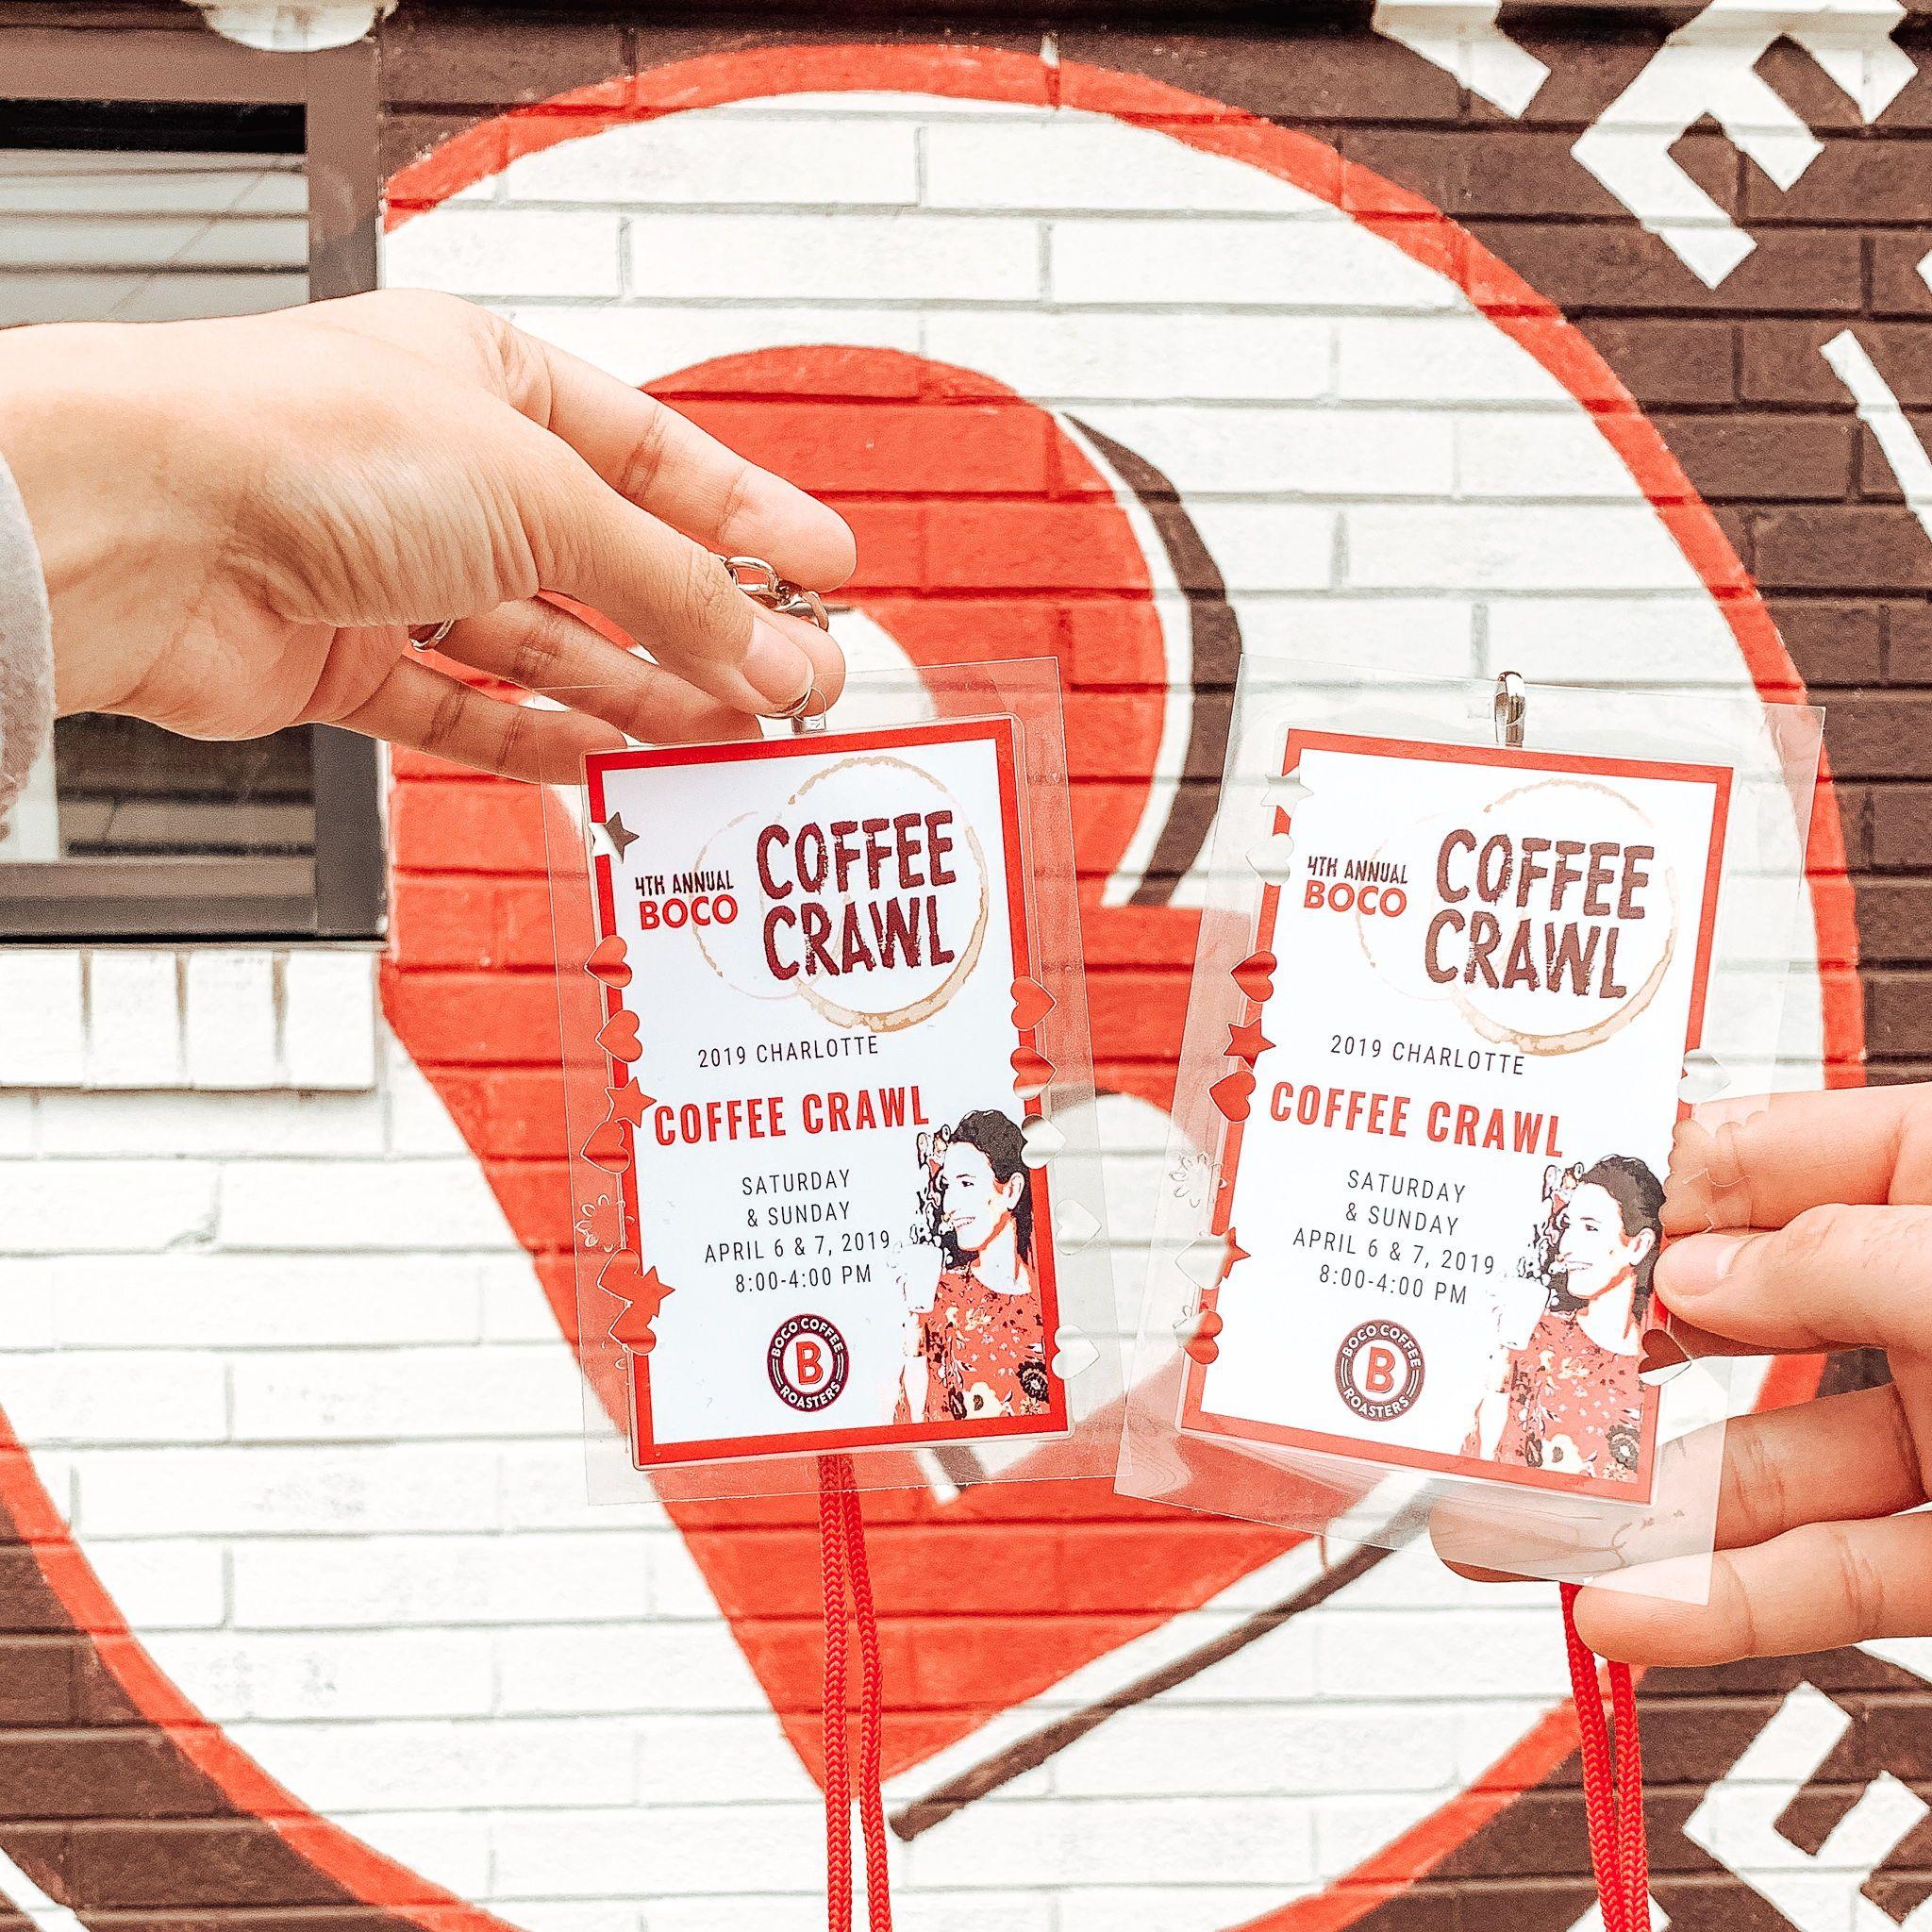 NEW BLOG POST: Rating The Boco Coffee Crawl Coffee Shops